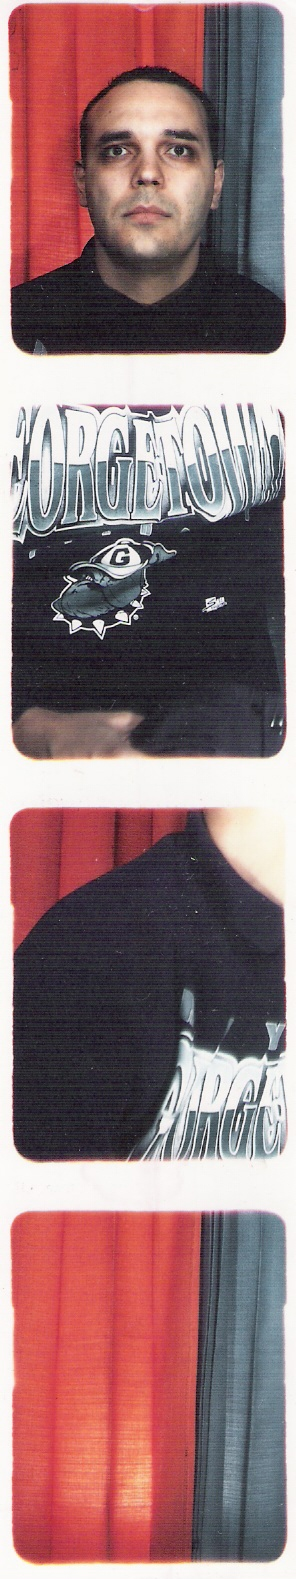 fotomatica3.jpg